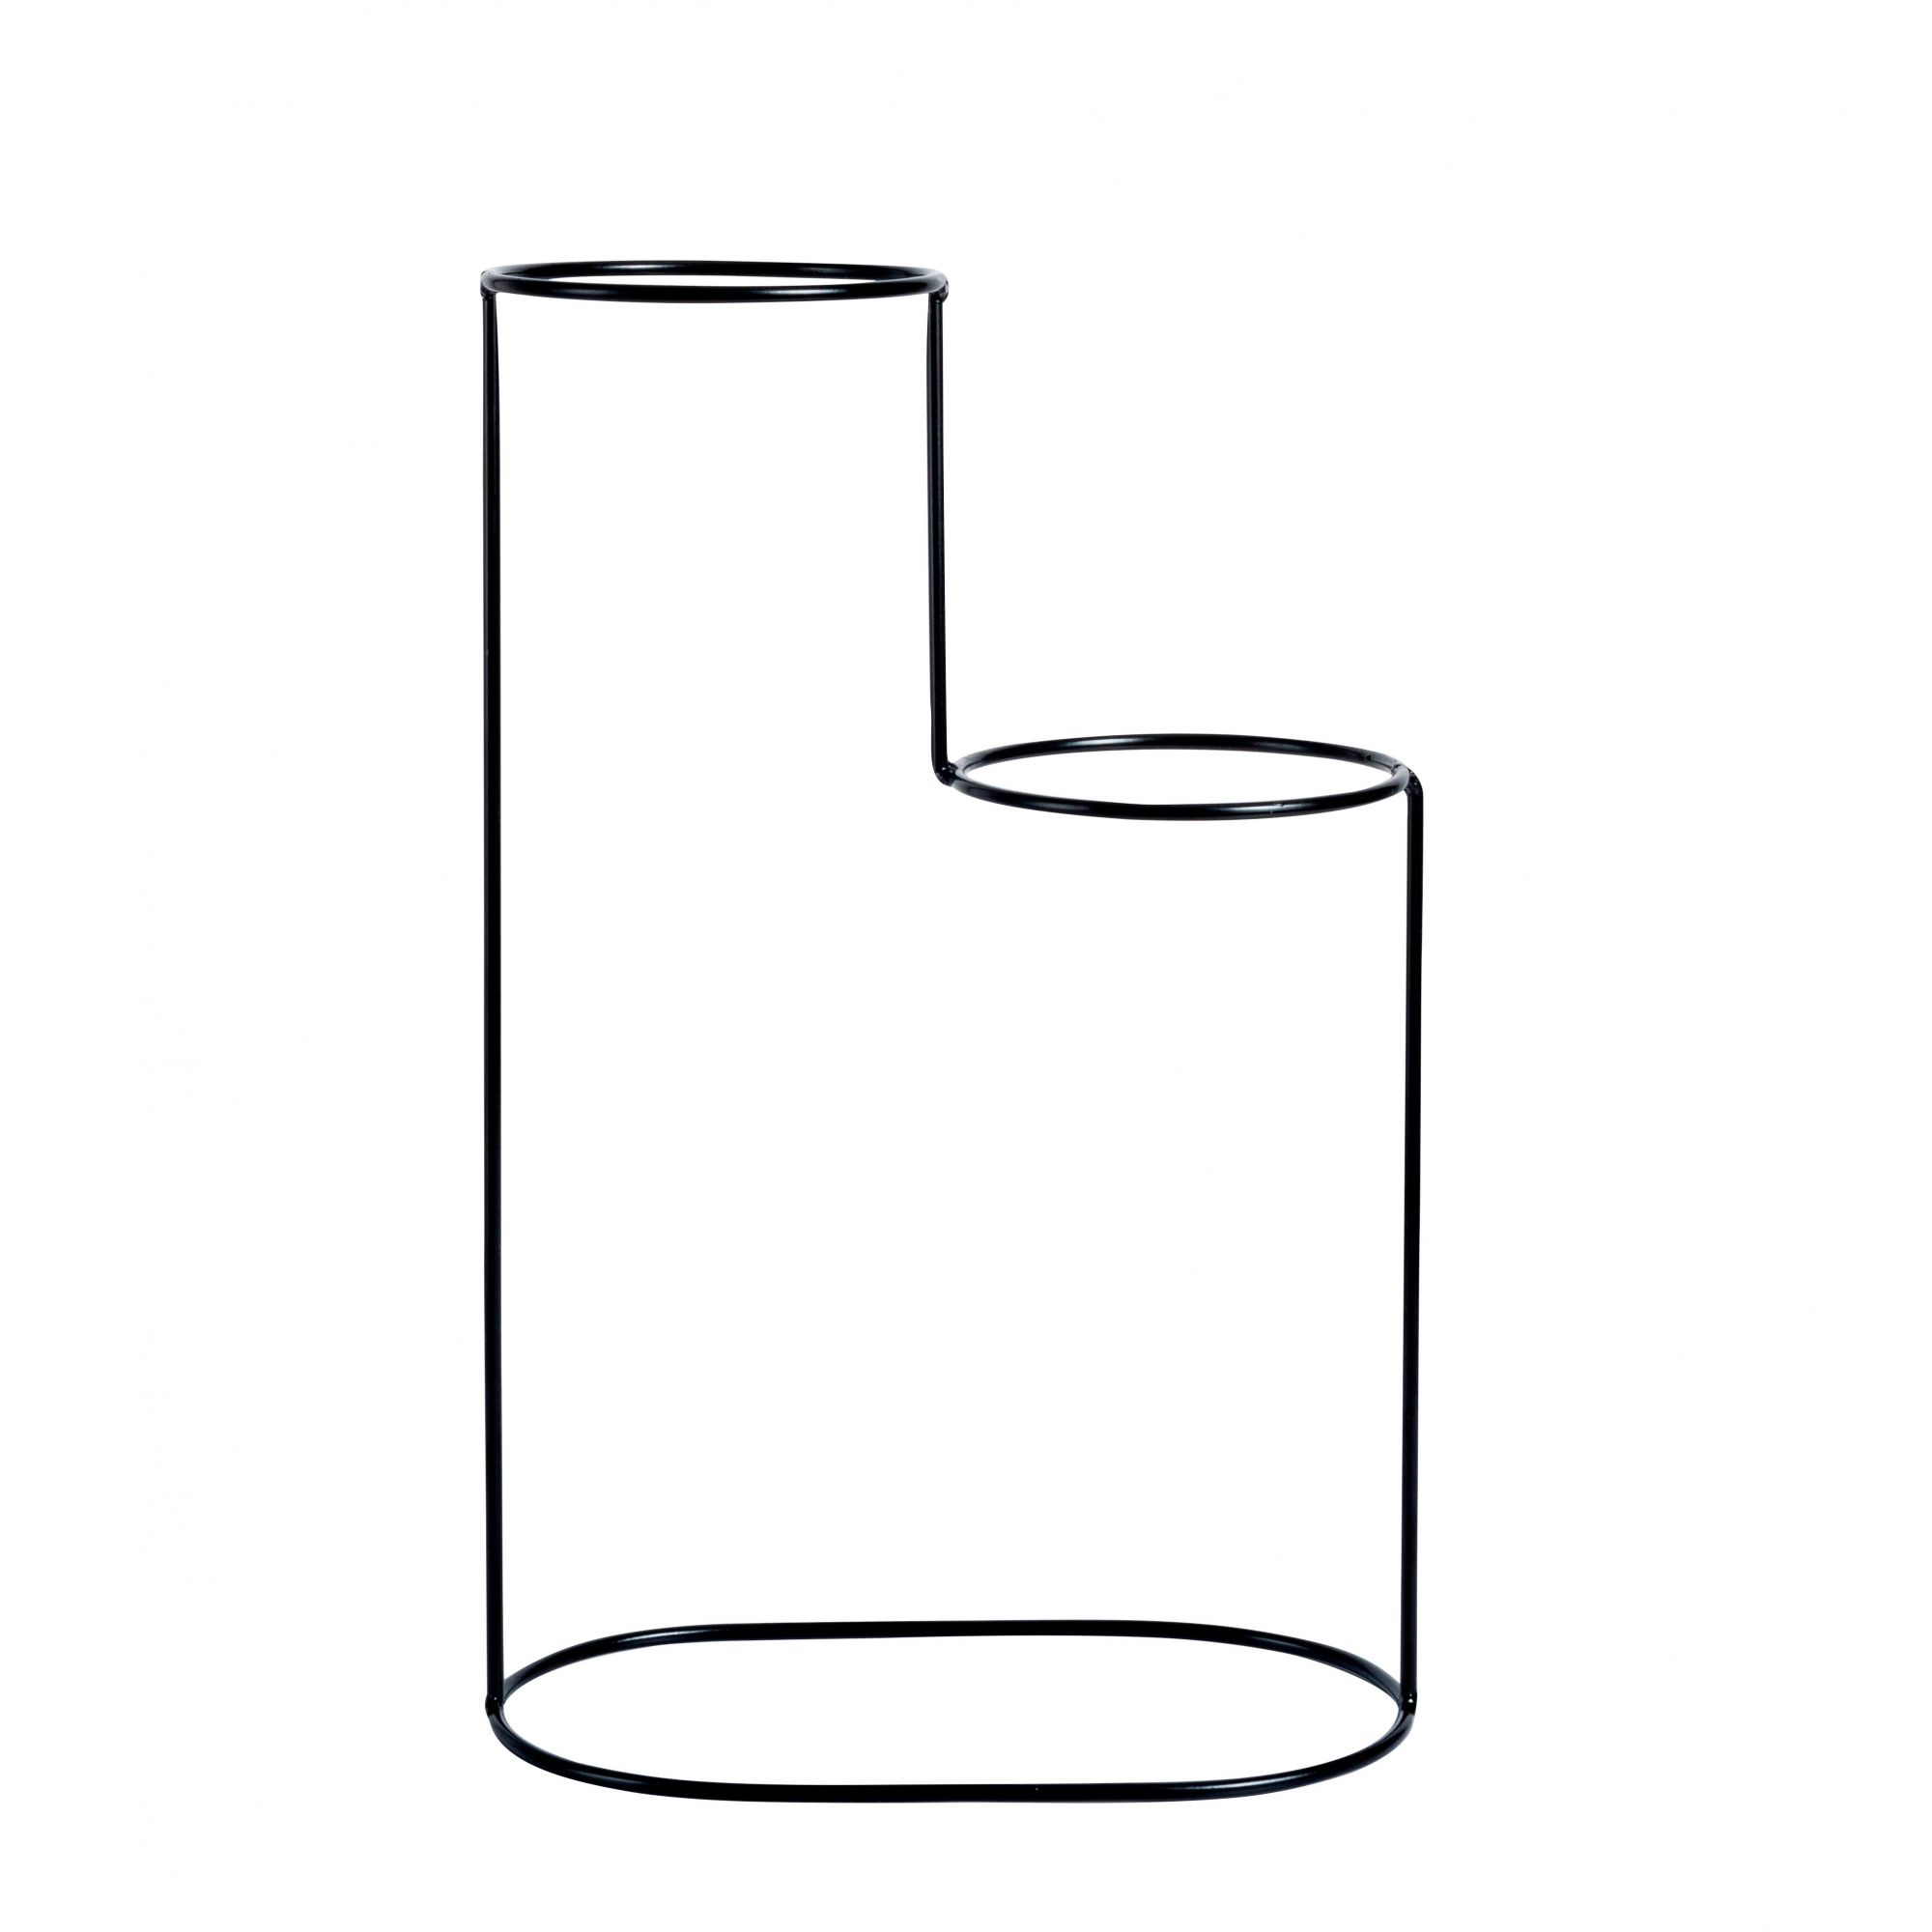 Suporte Aramado Cascata Preto 30cm para 02 Vasos Raiz Pequenos N02  - Vasos Raiz Loja Oficial